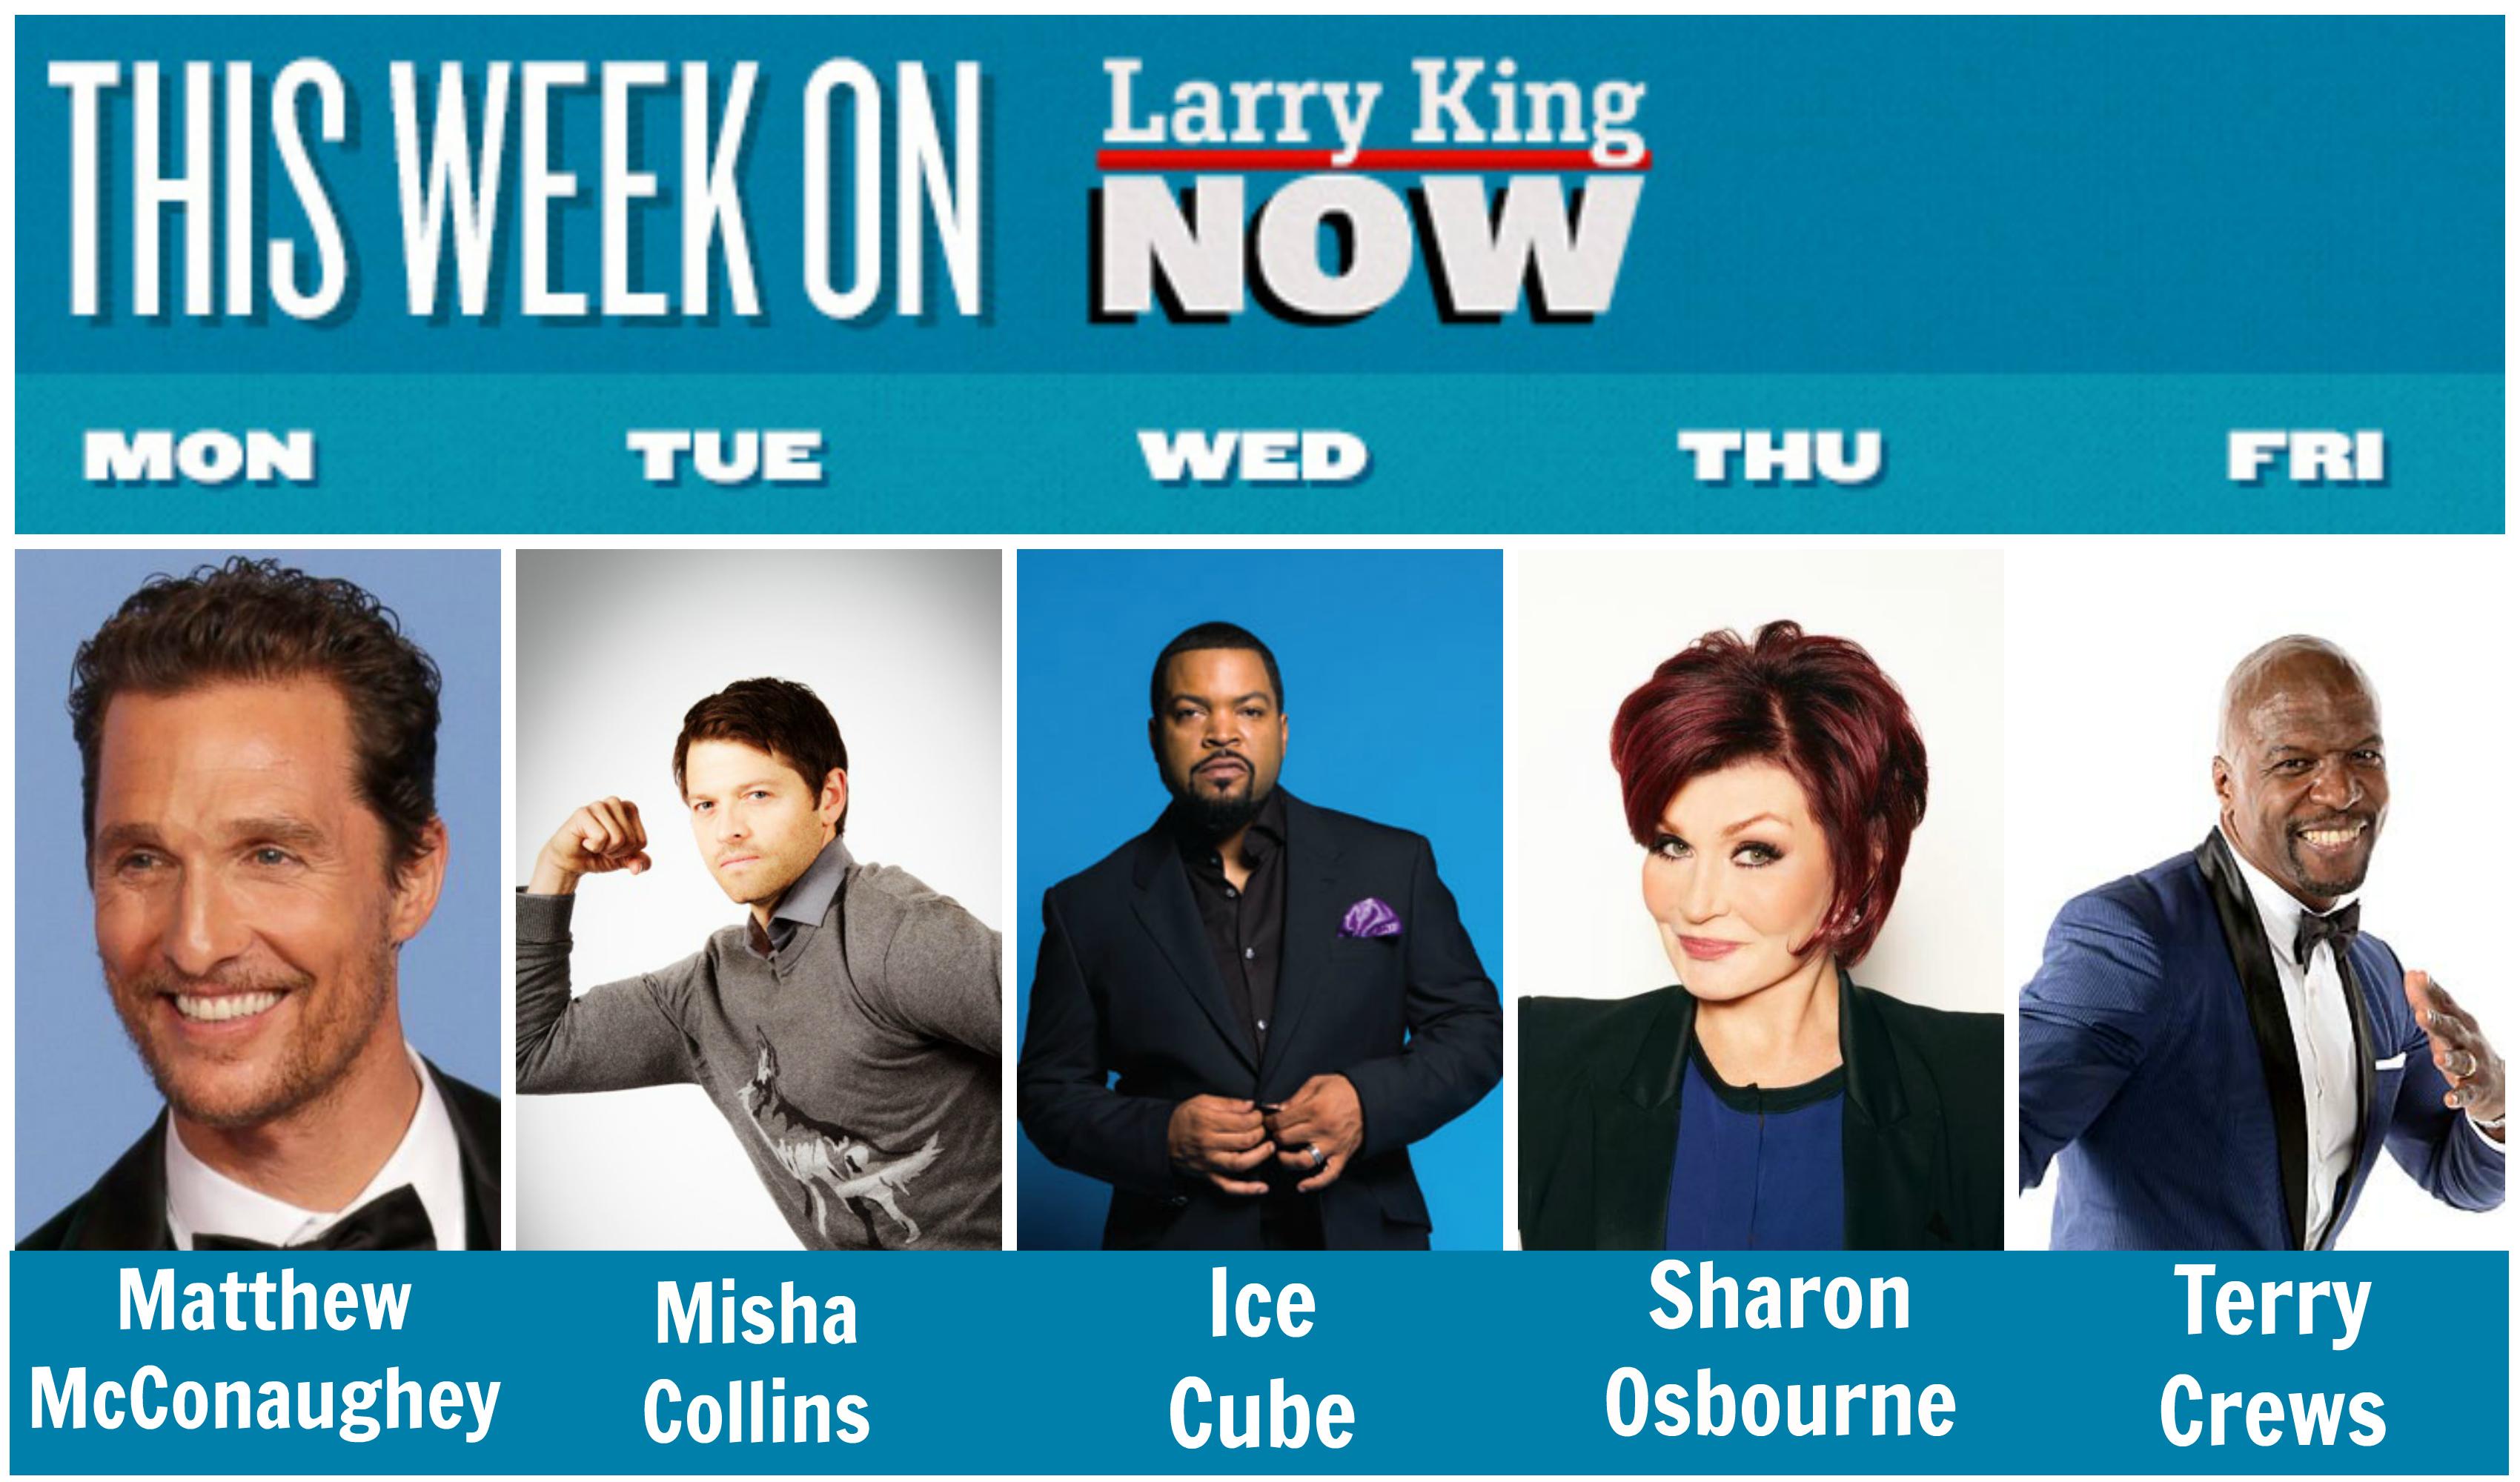 This Week on Larry King Now - Matthew McConaughey, Misha Collins, Ice Cube, Sharon Osbourne, Terry Crews